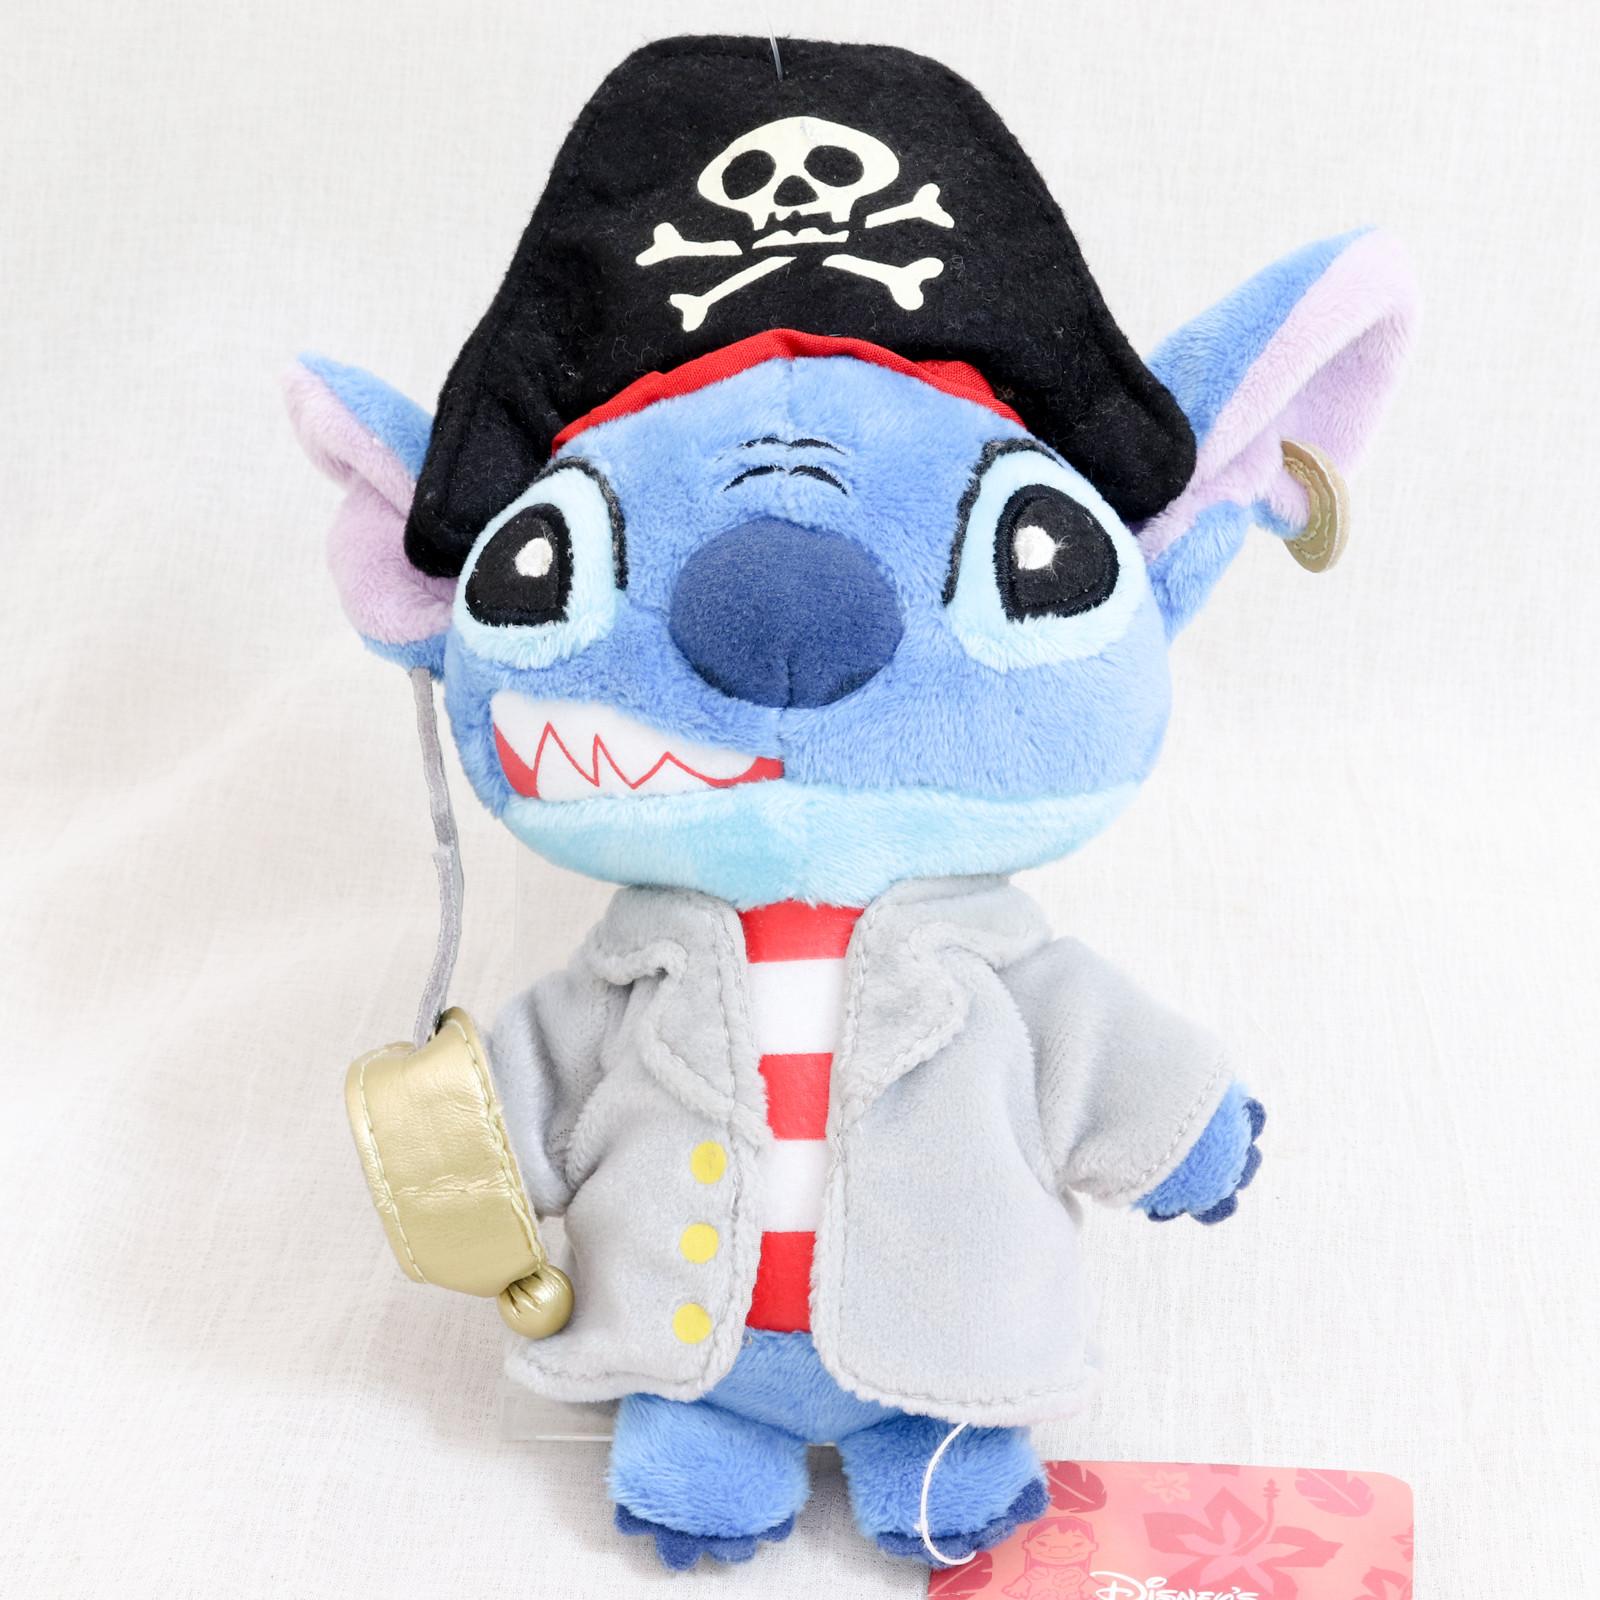 Disney Stitch 7 inch Plush doll Pirate Mascot Figure Young Epoch JAPAN